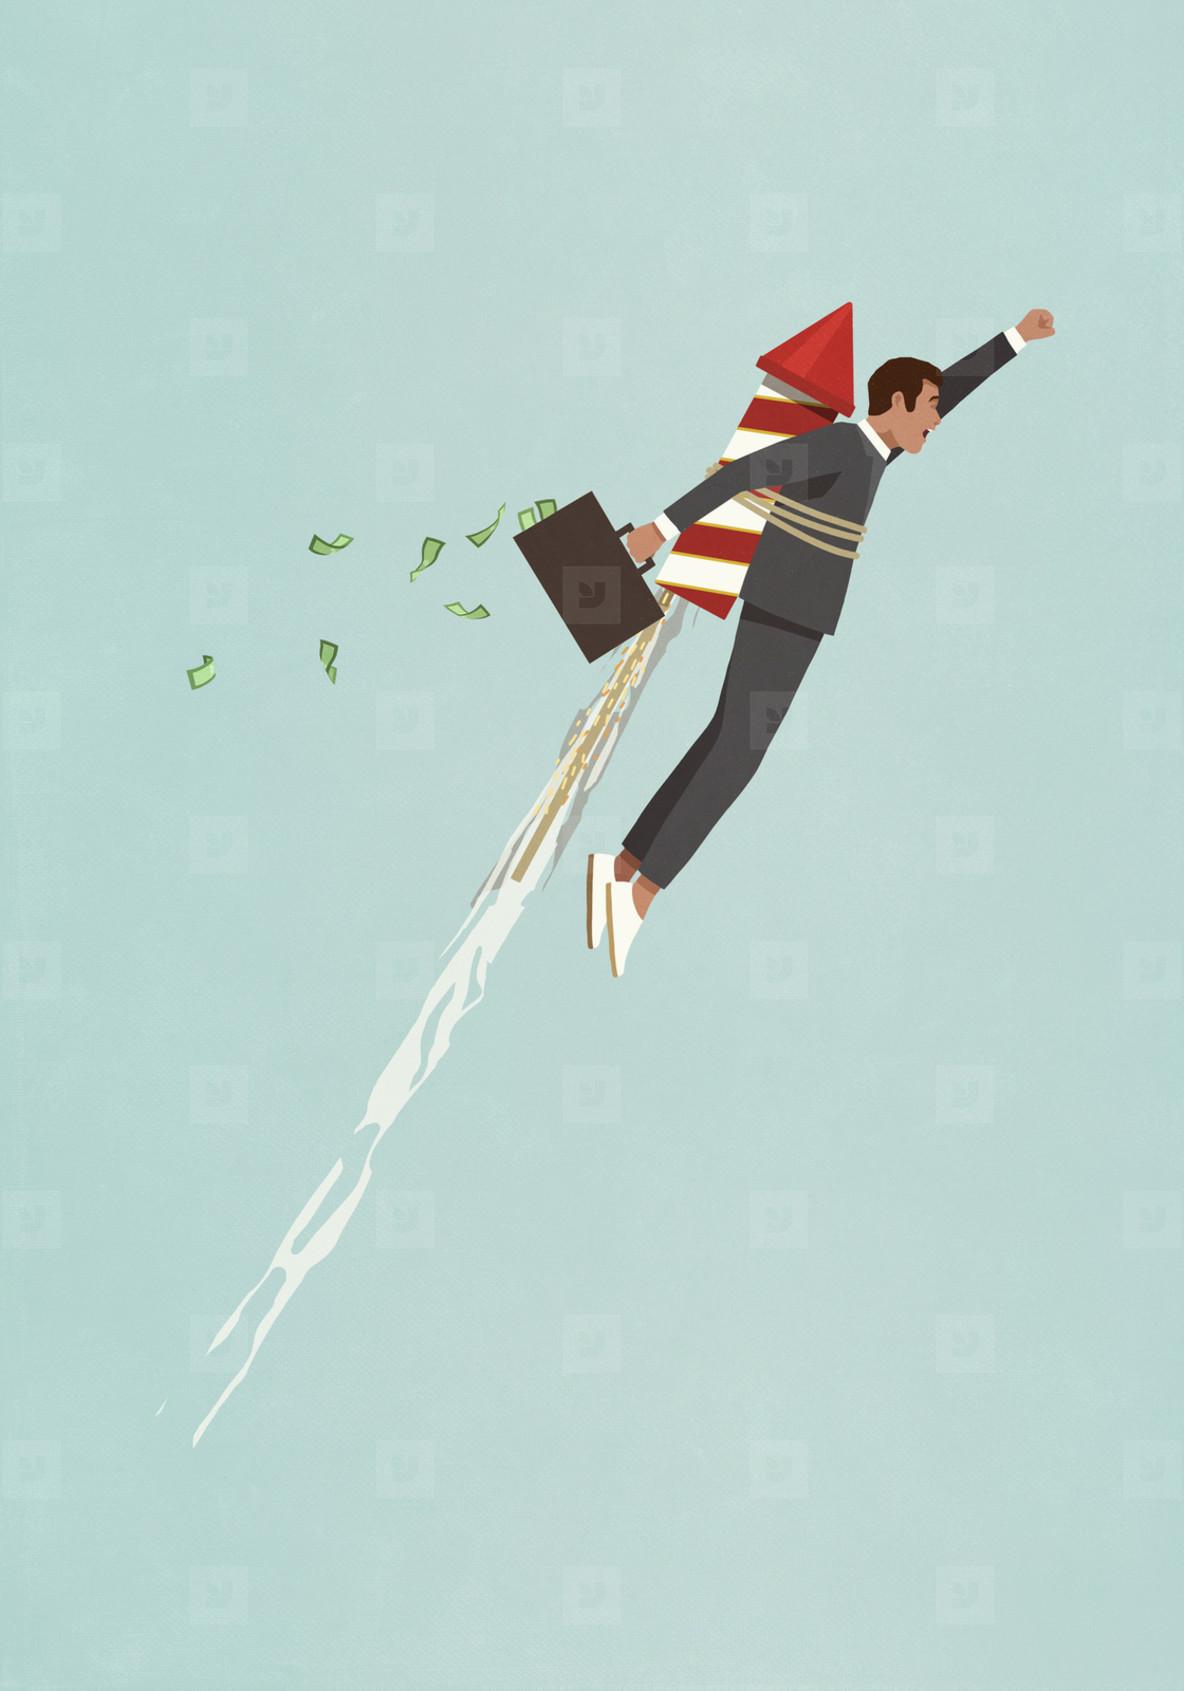 Businessman with rocket accelerating upwards